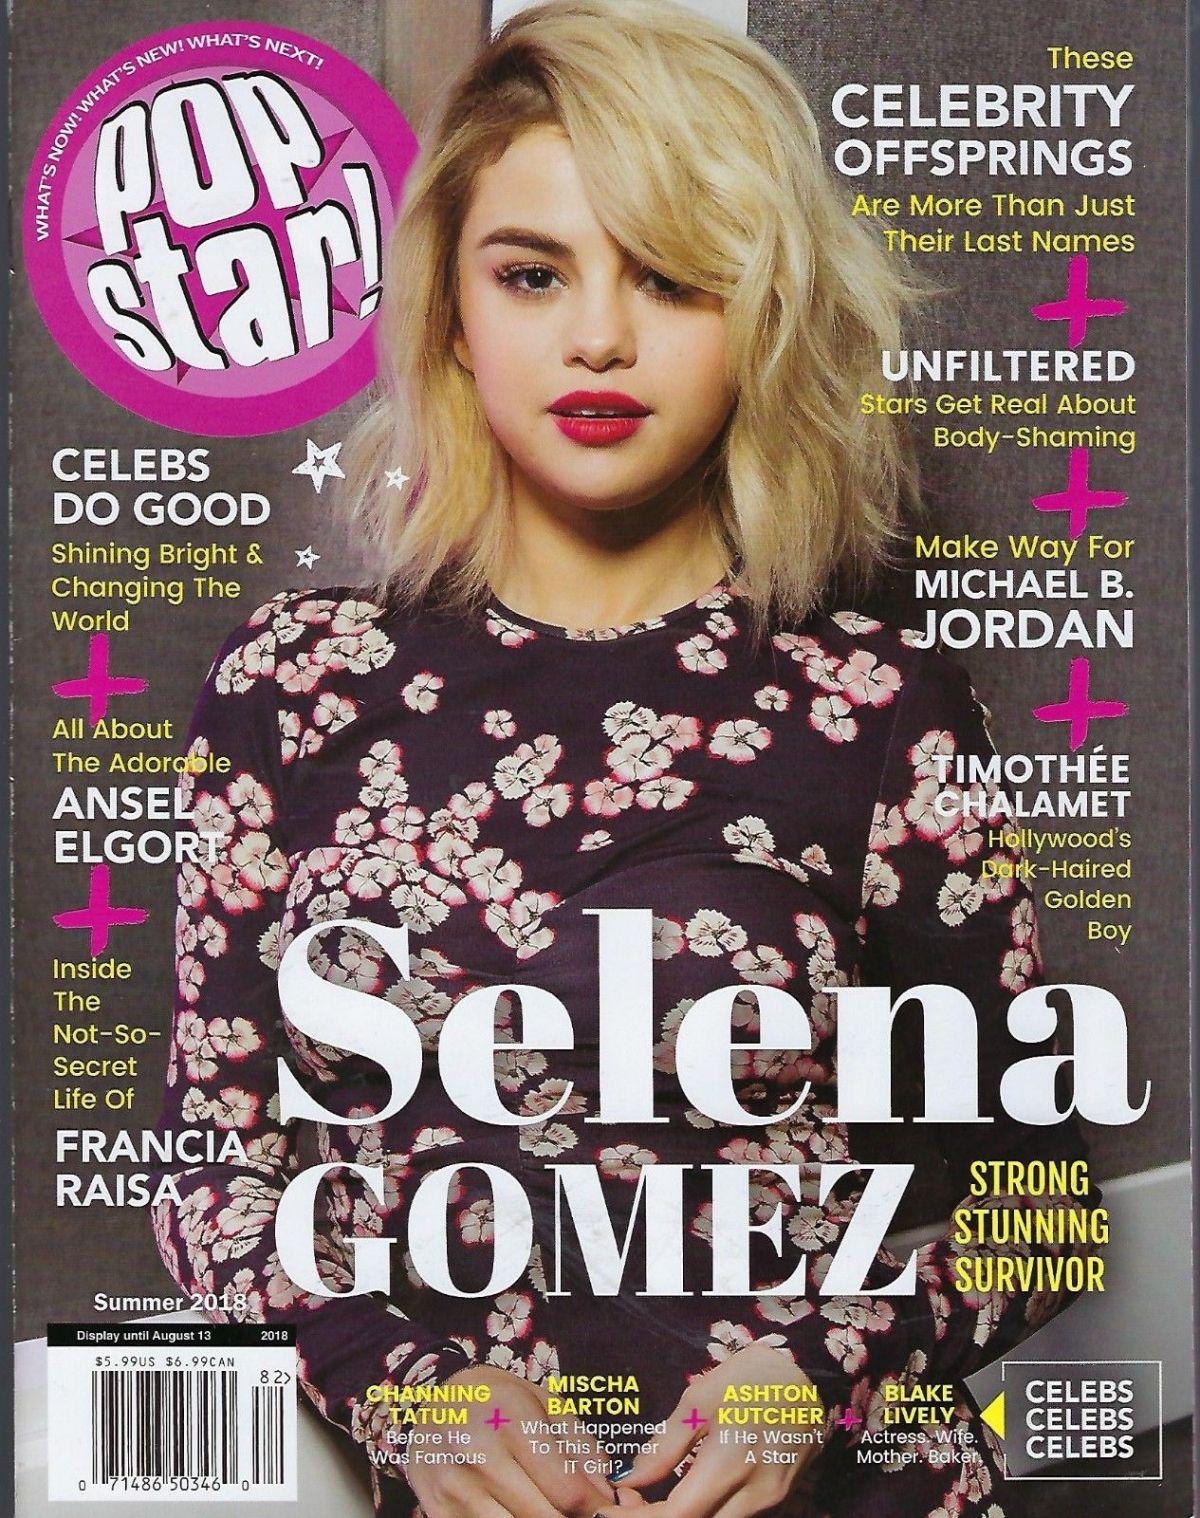 SELENA GOMEZ On The Cover Of Pop Star! Magazine, Summer